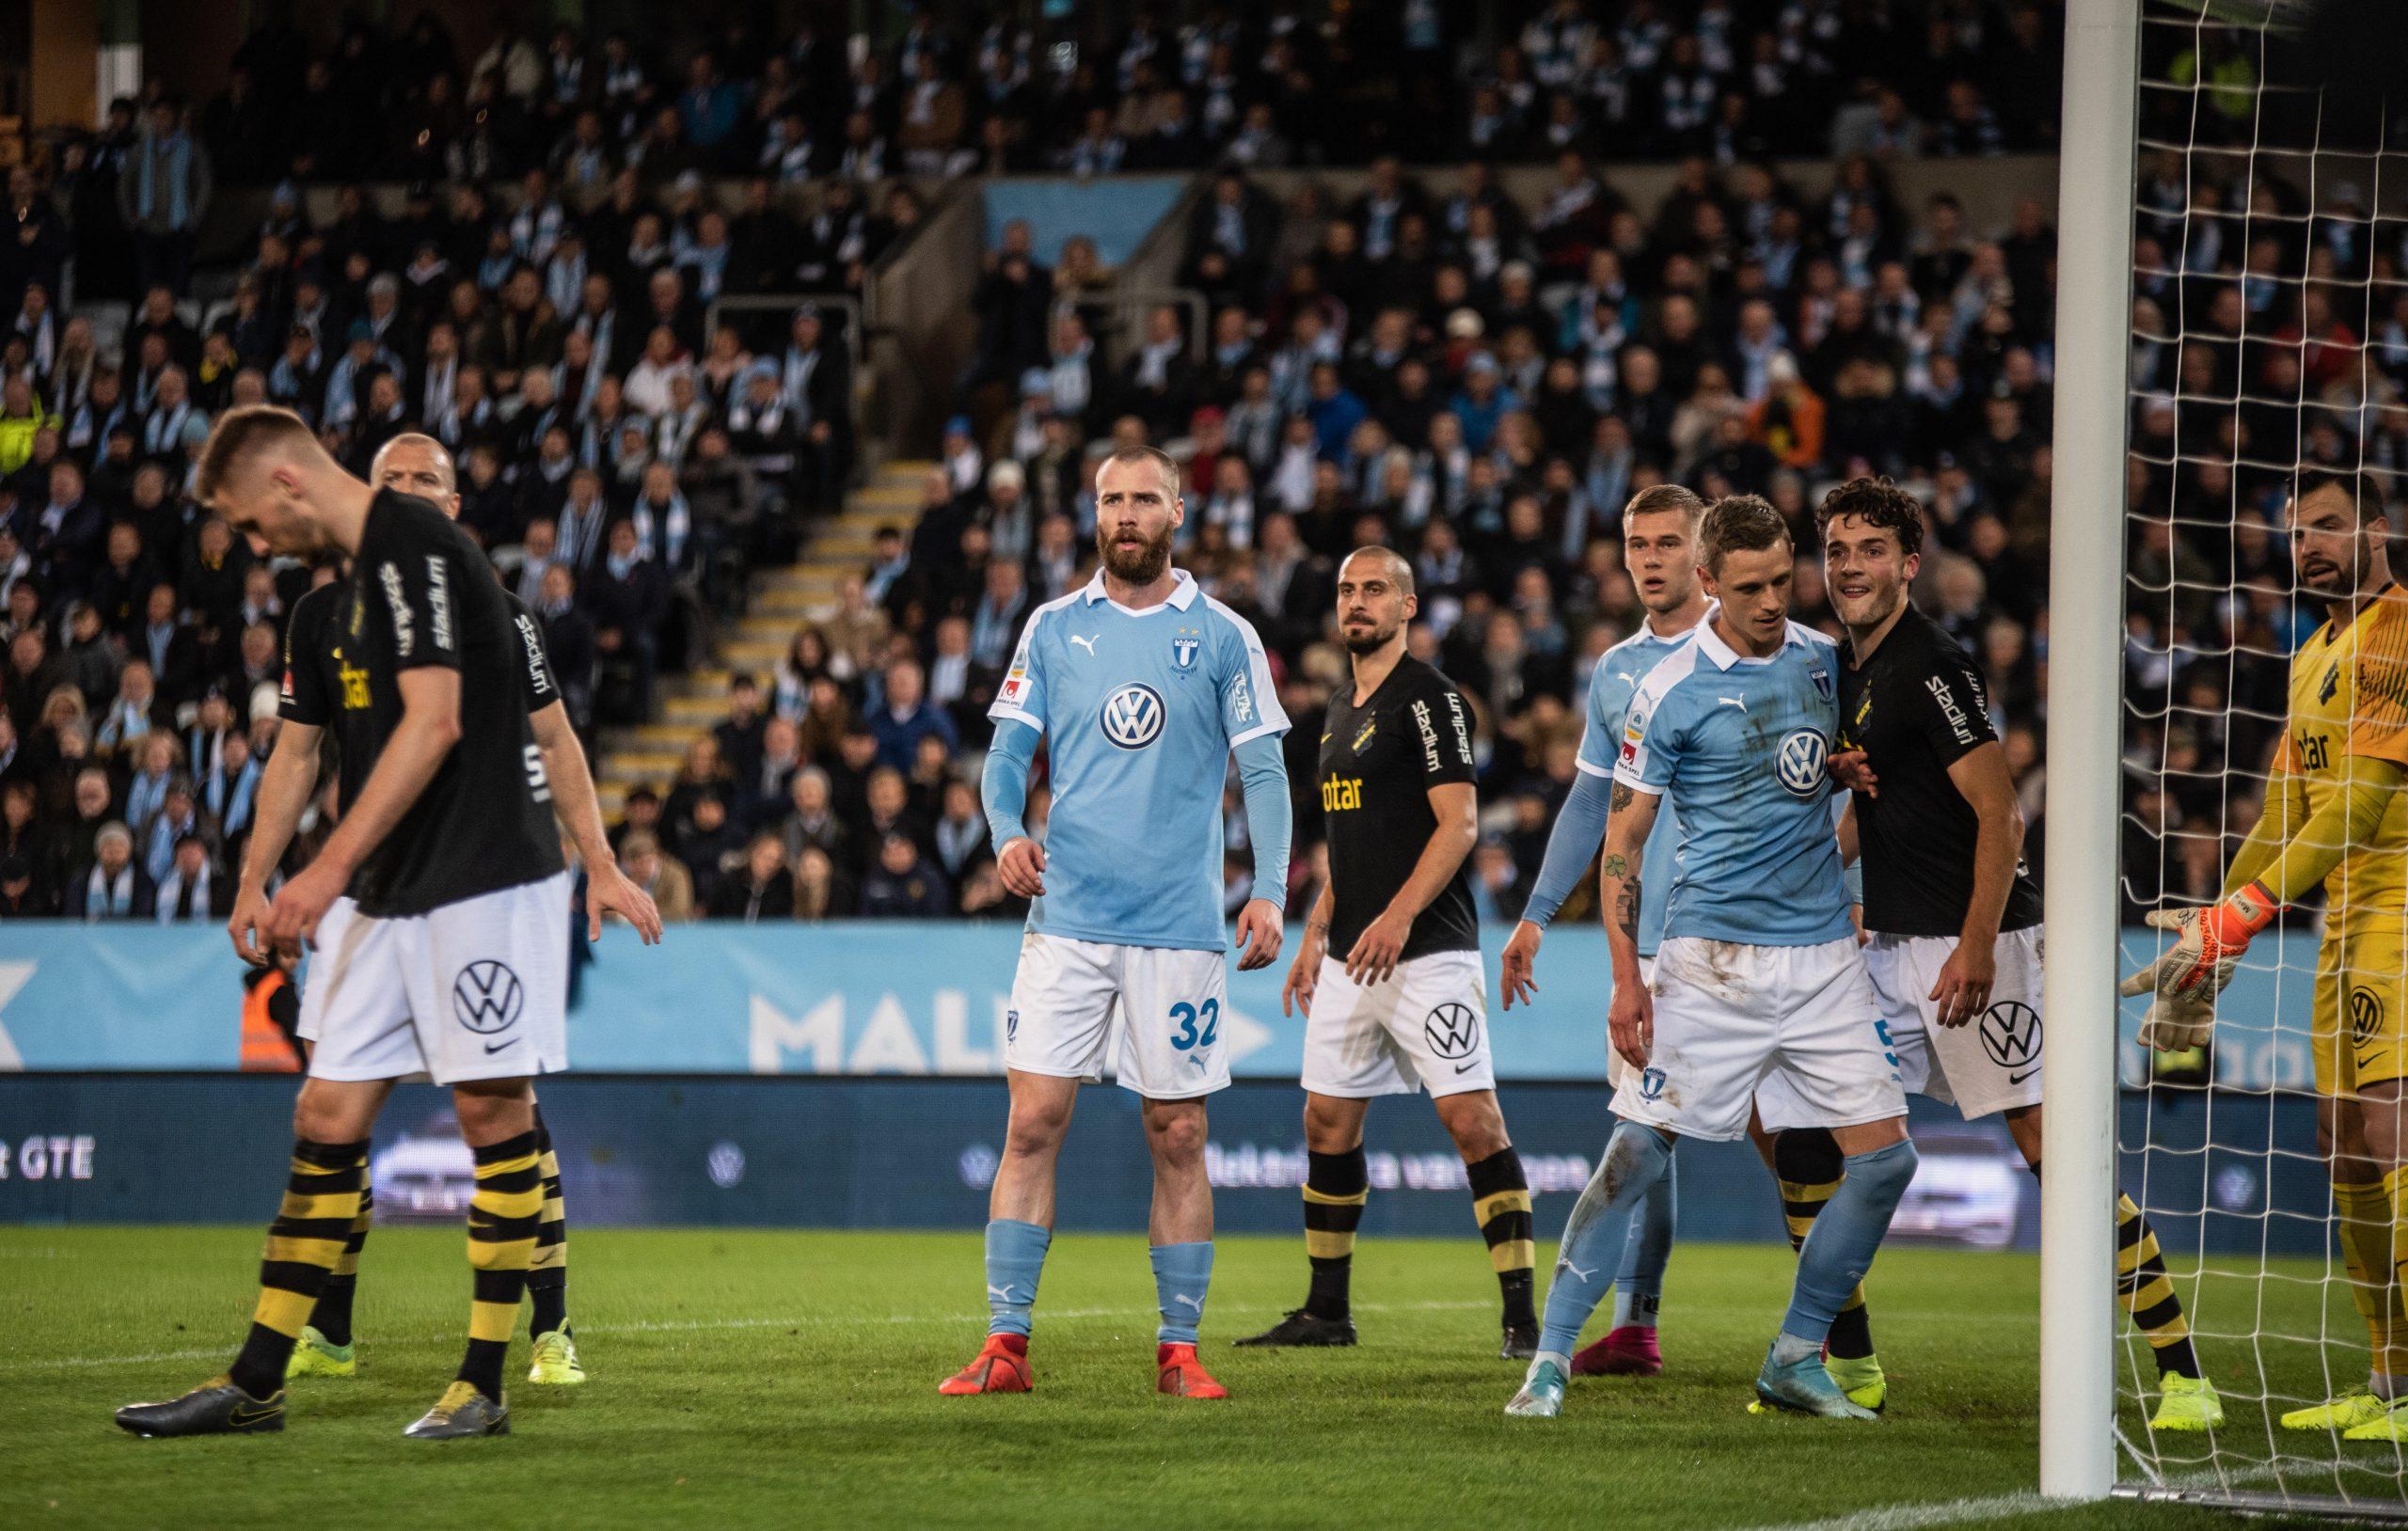 Streama Malmö FF – AIK: Se live stream & TV (27/10)